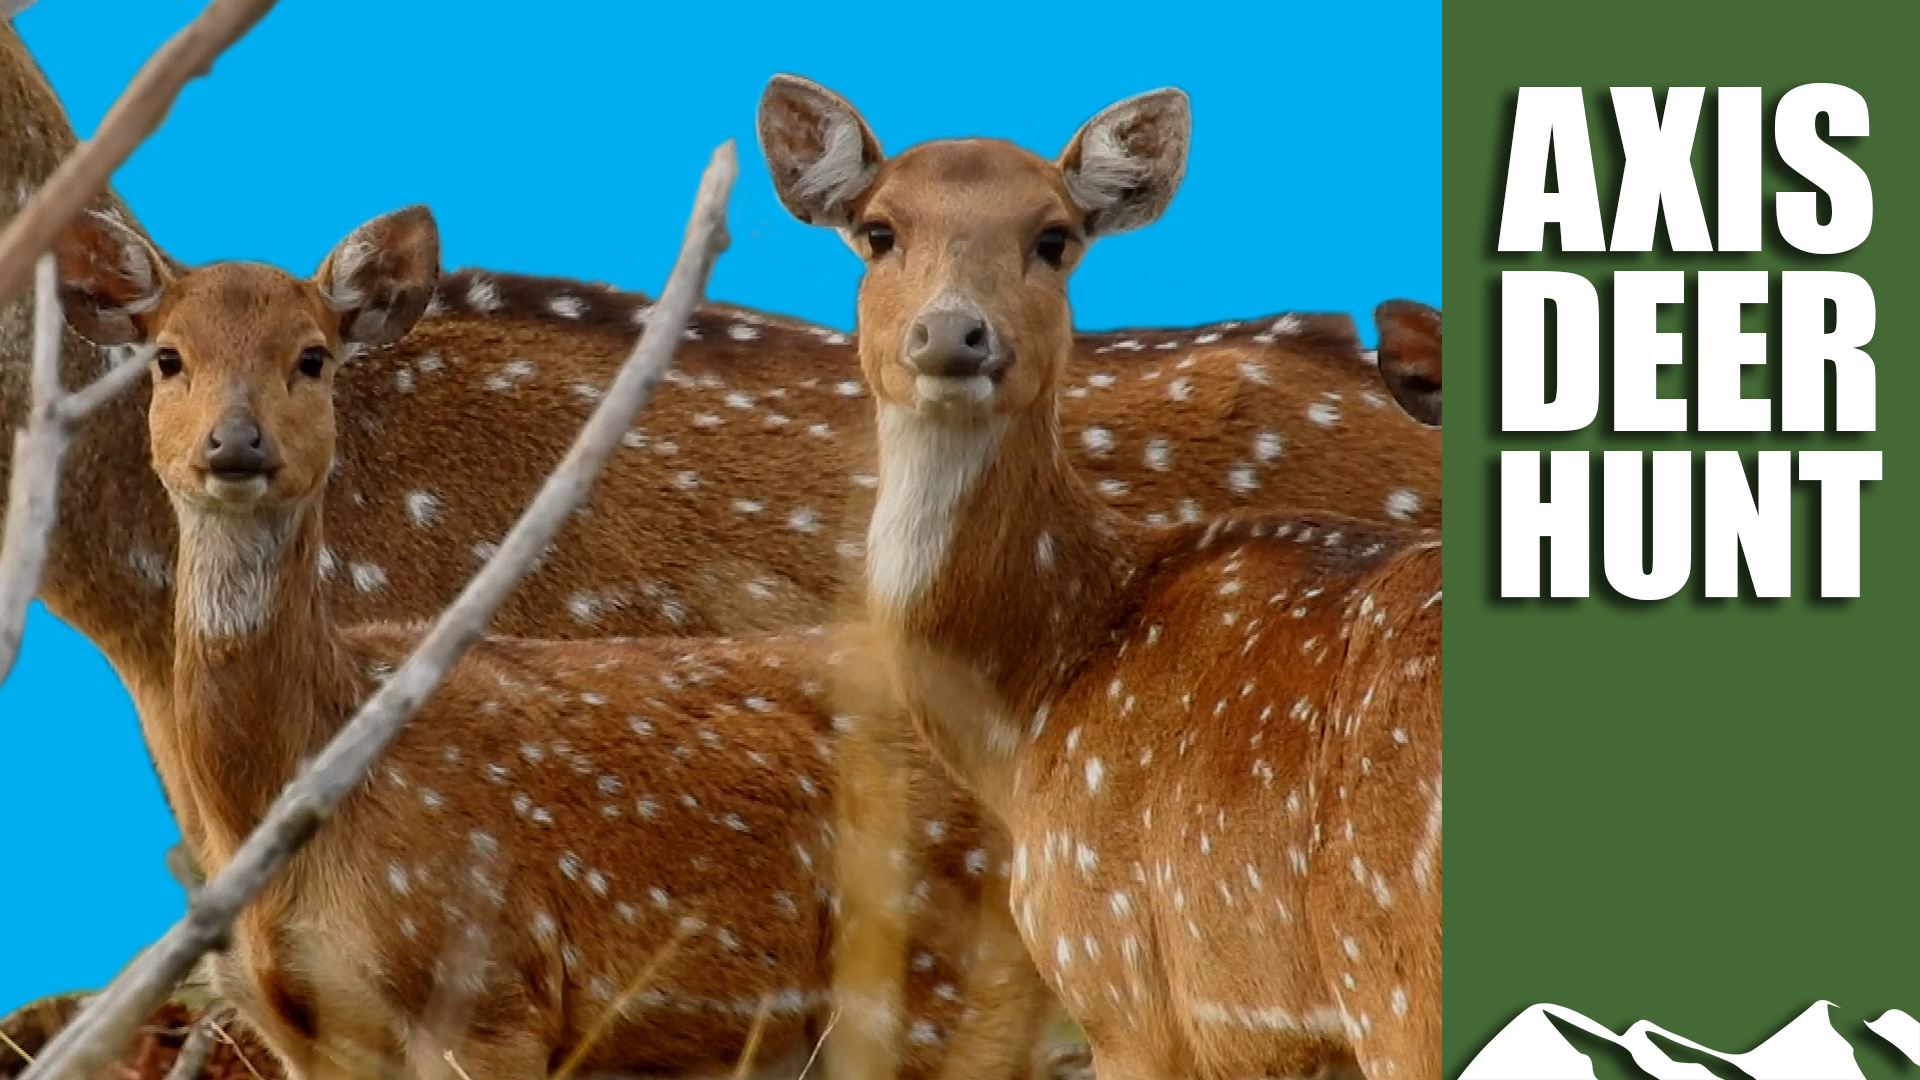 e408-axis-deer